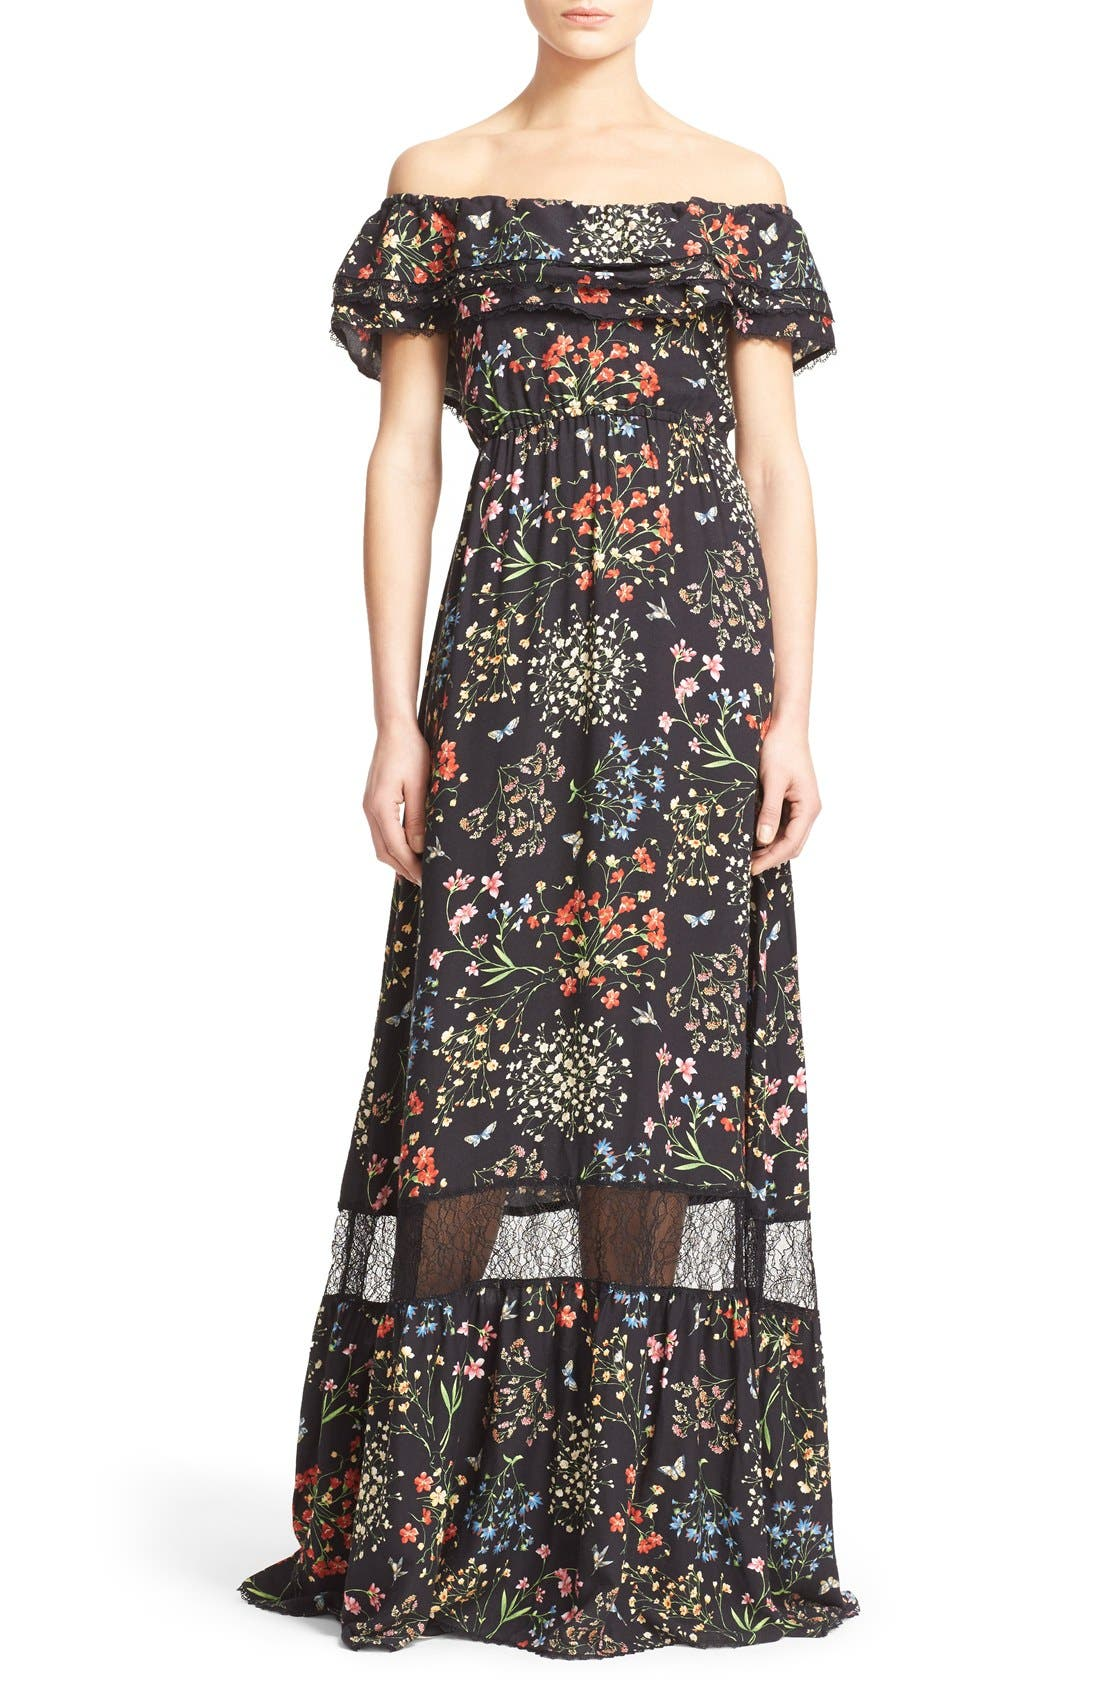 Main Image - Alice + Olivia 'Cheri' Floral Print Off the Shoulder Maxi Dress